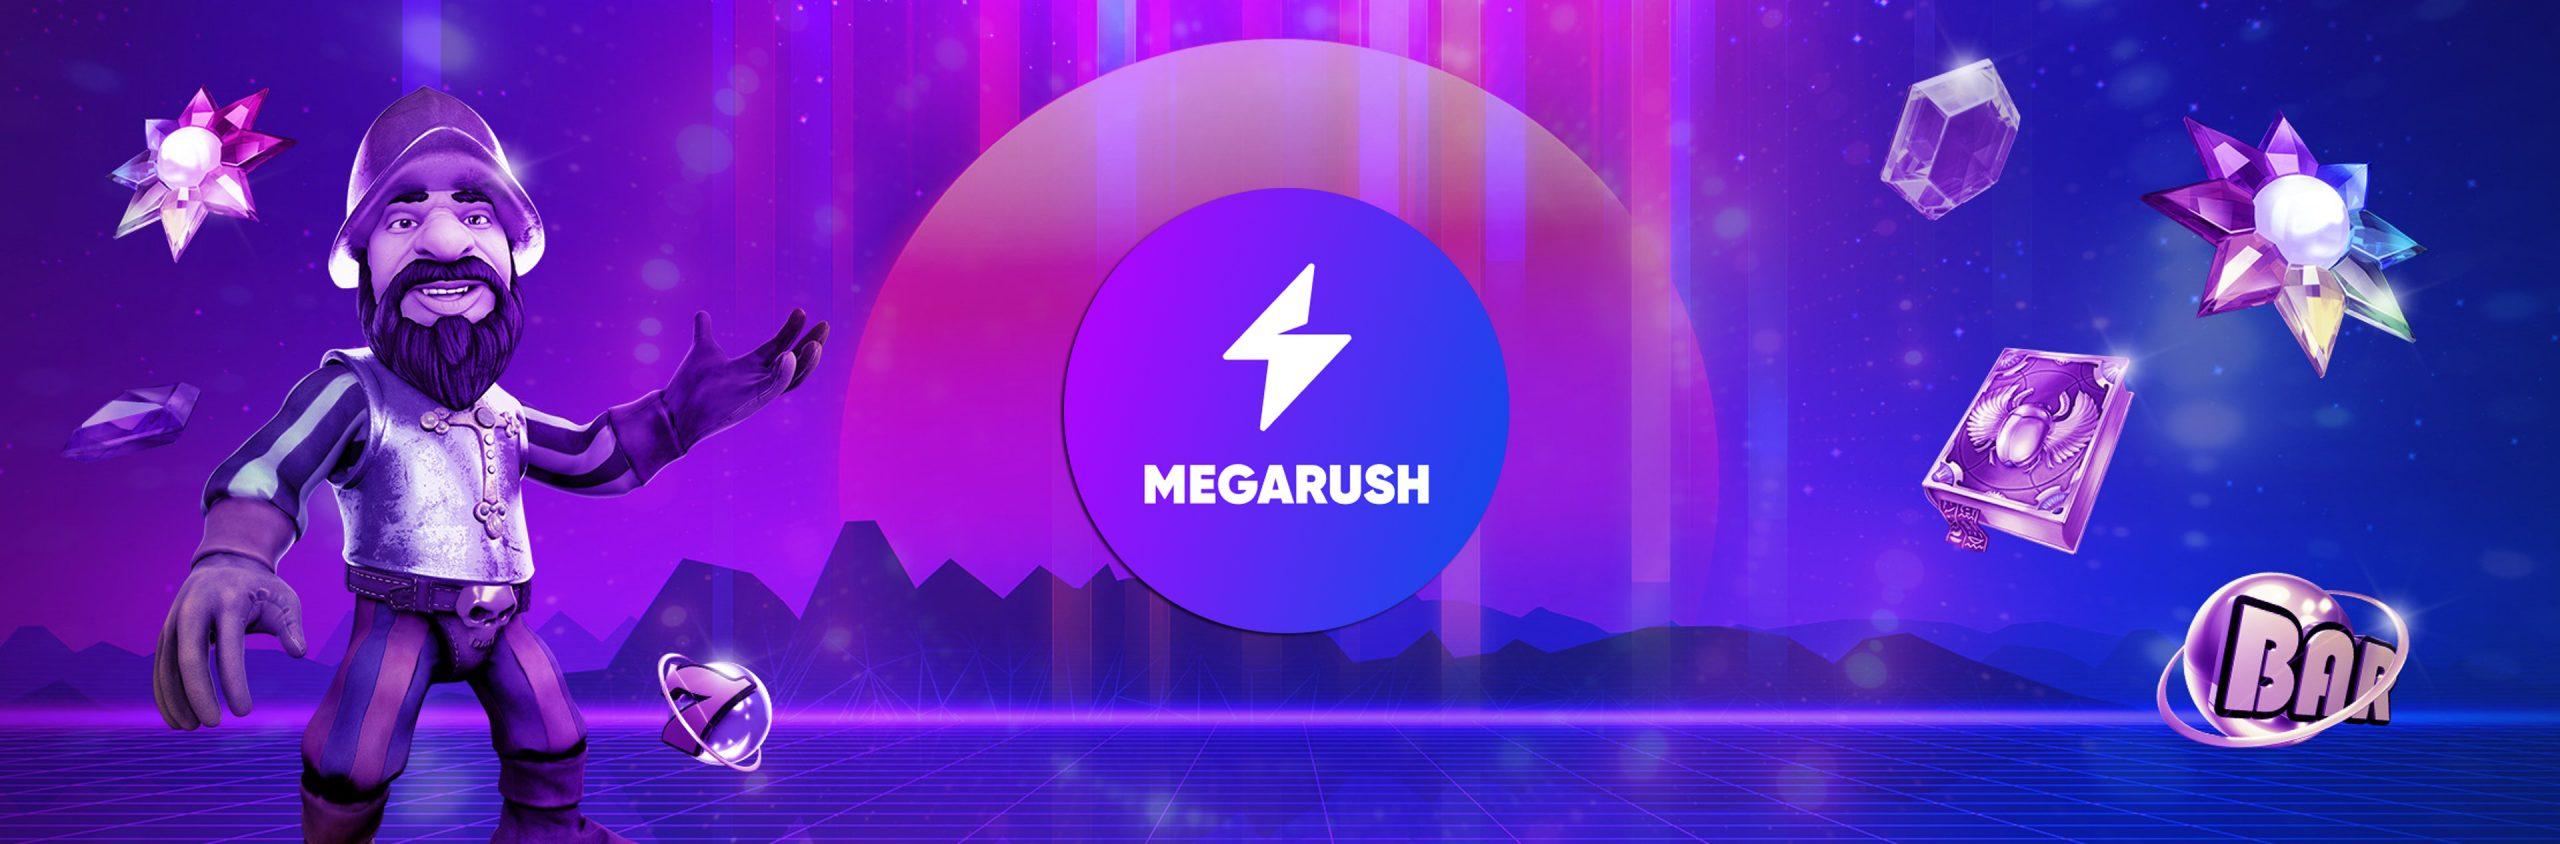 Megarush Casino banner